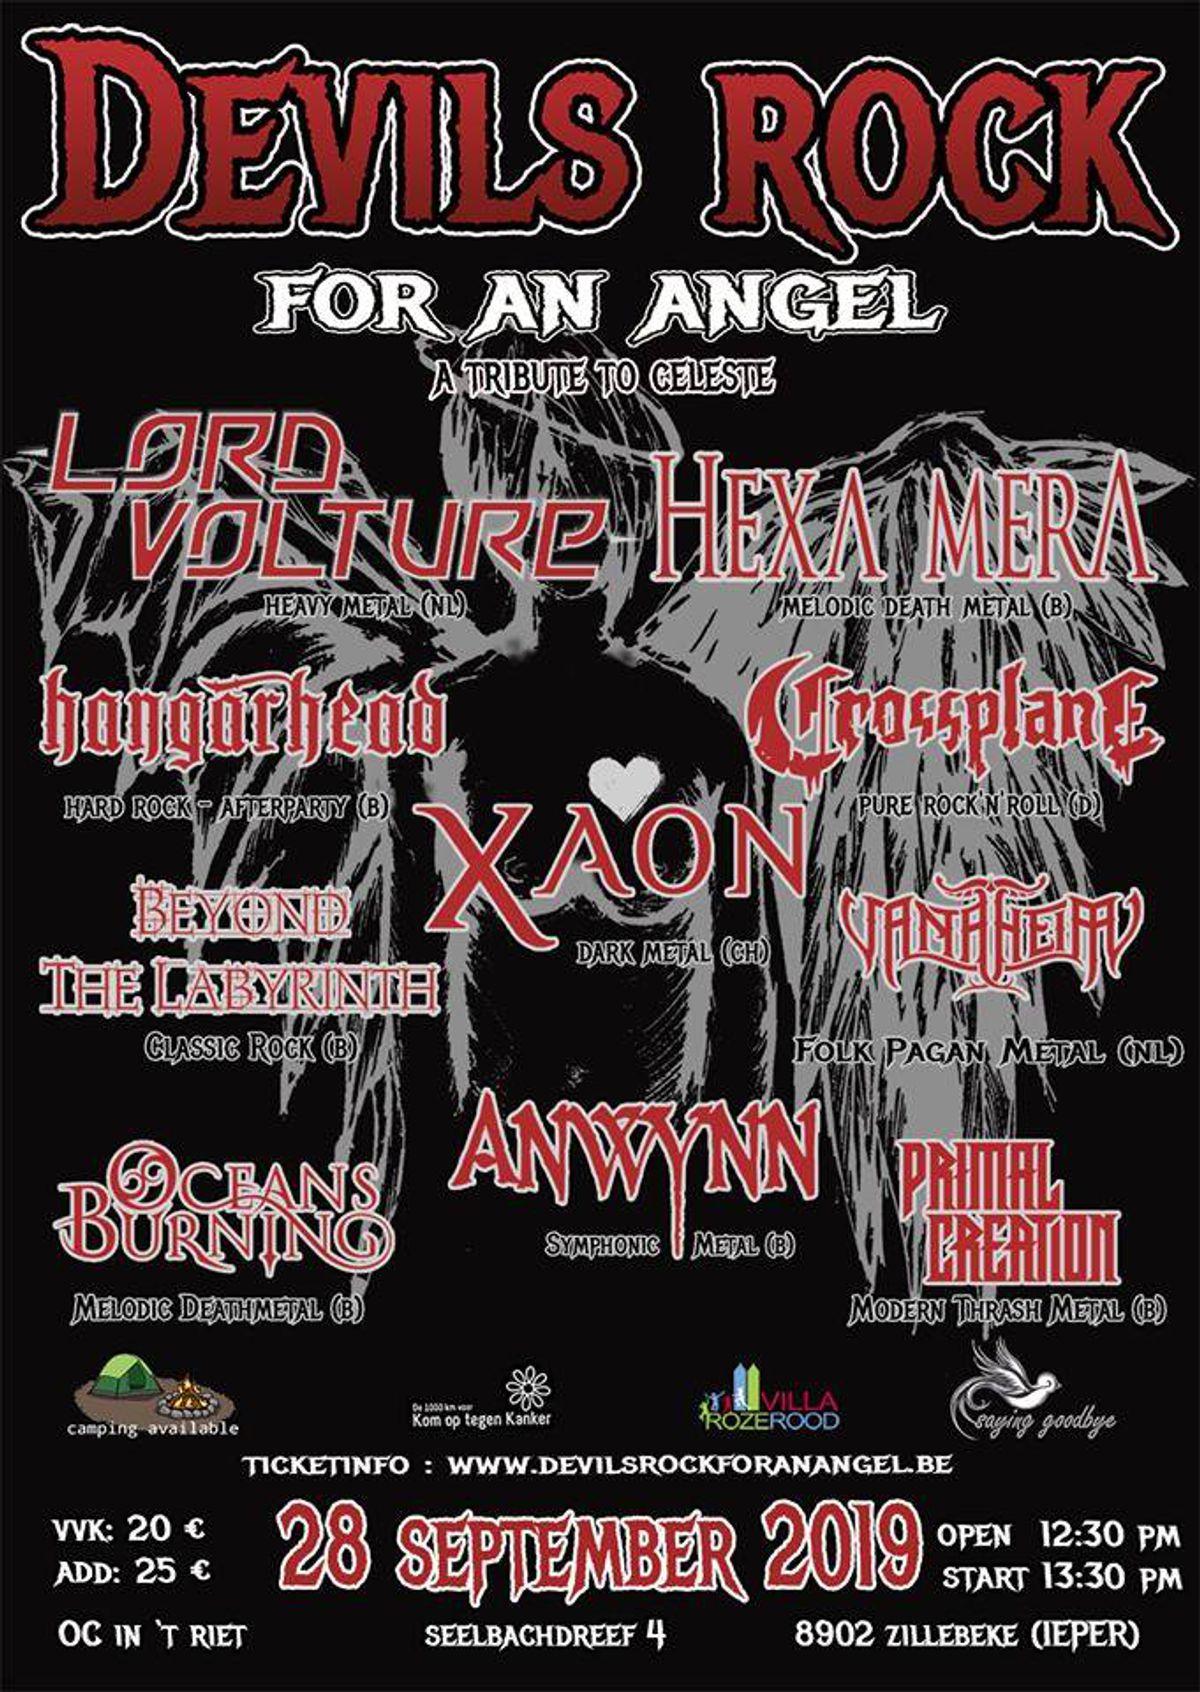 Devils Rock For An Angel 2019</b> - Rock-'n-roll met een hart